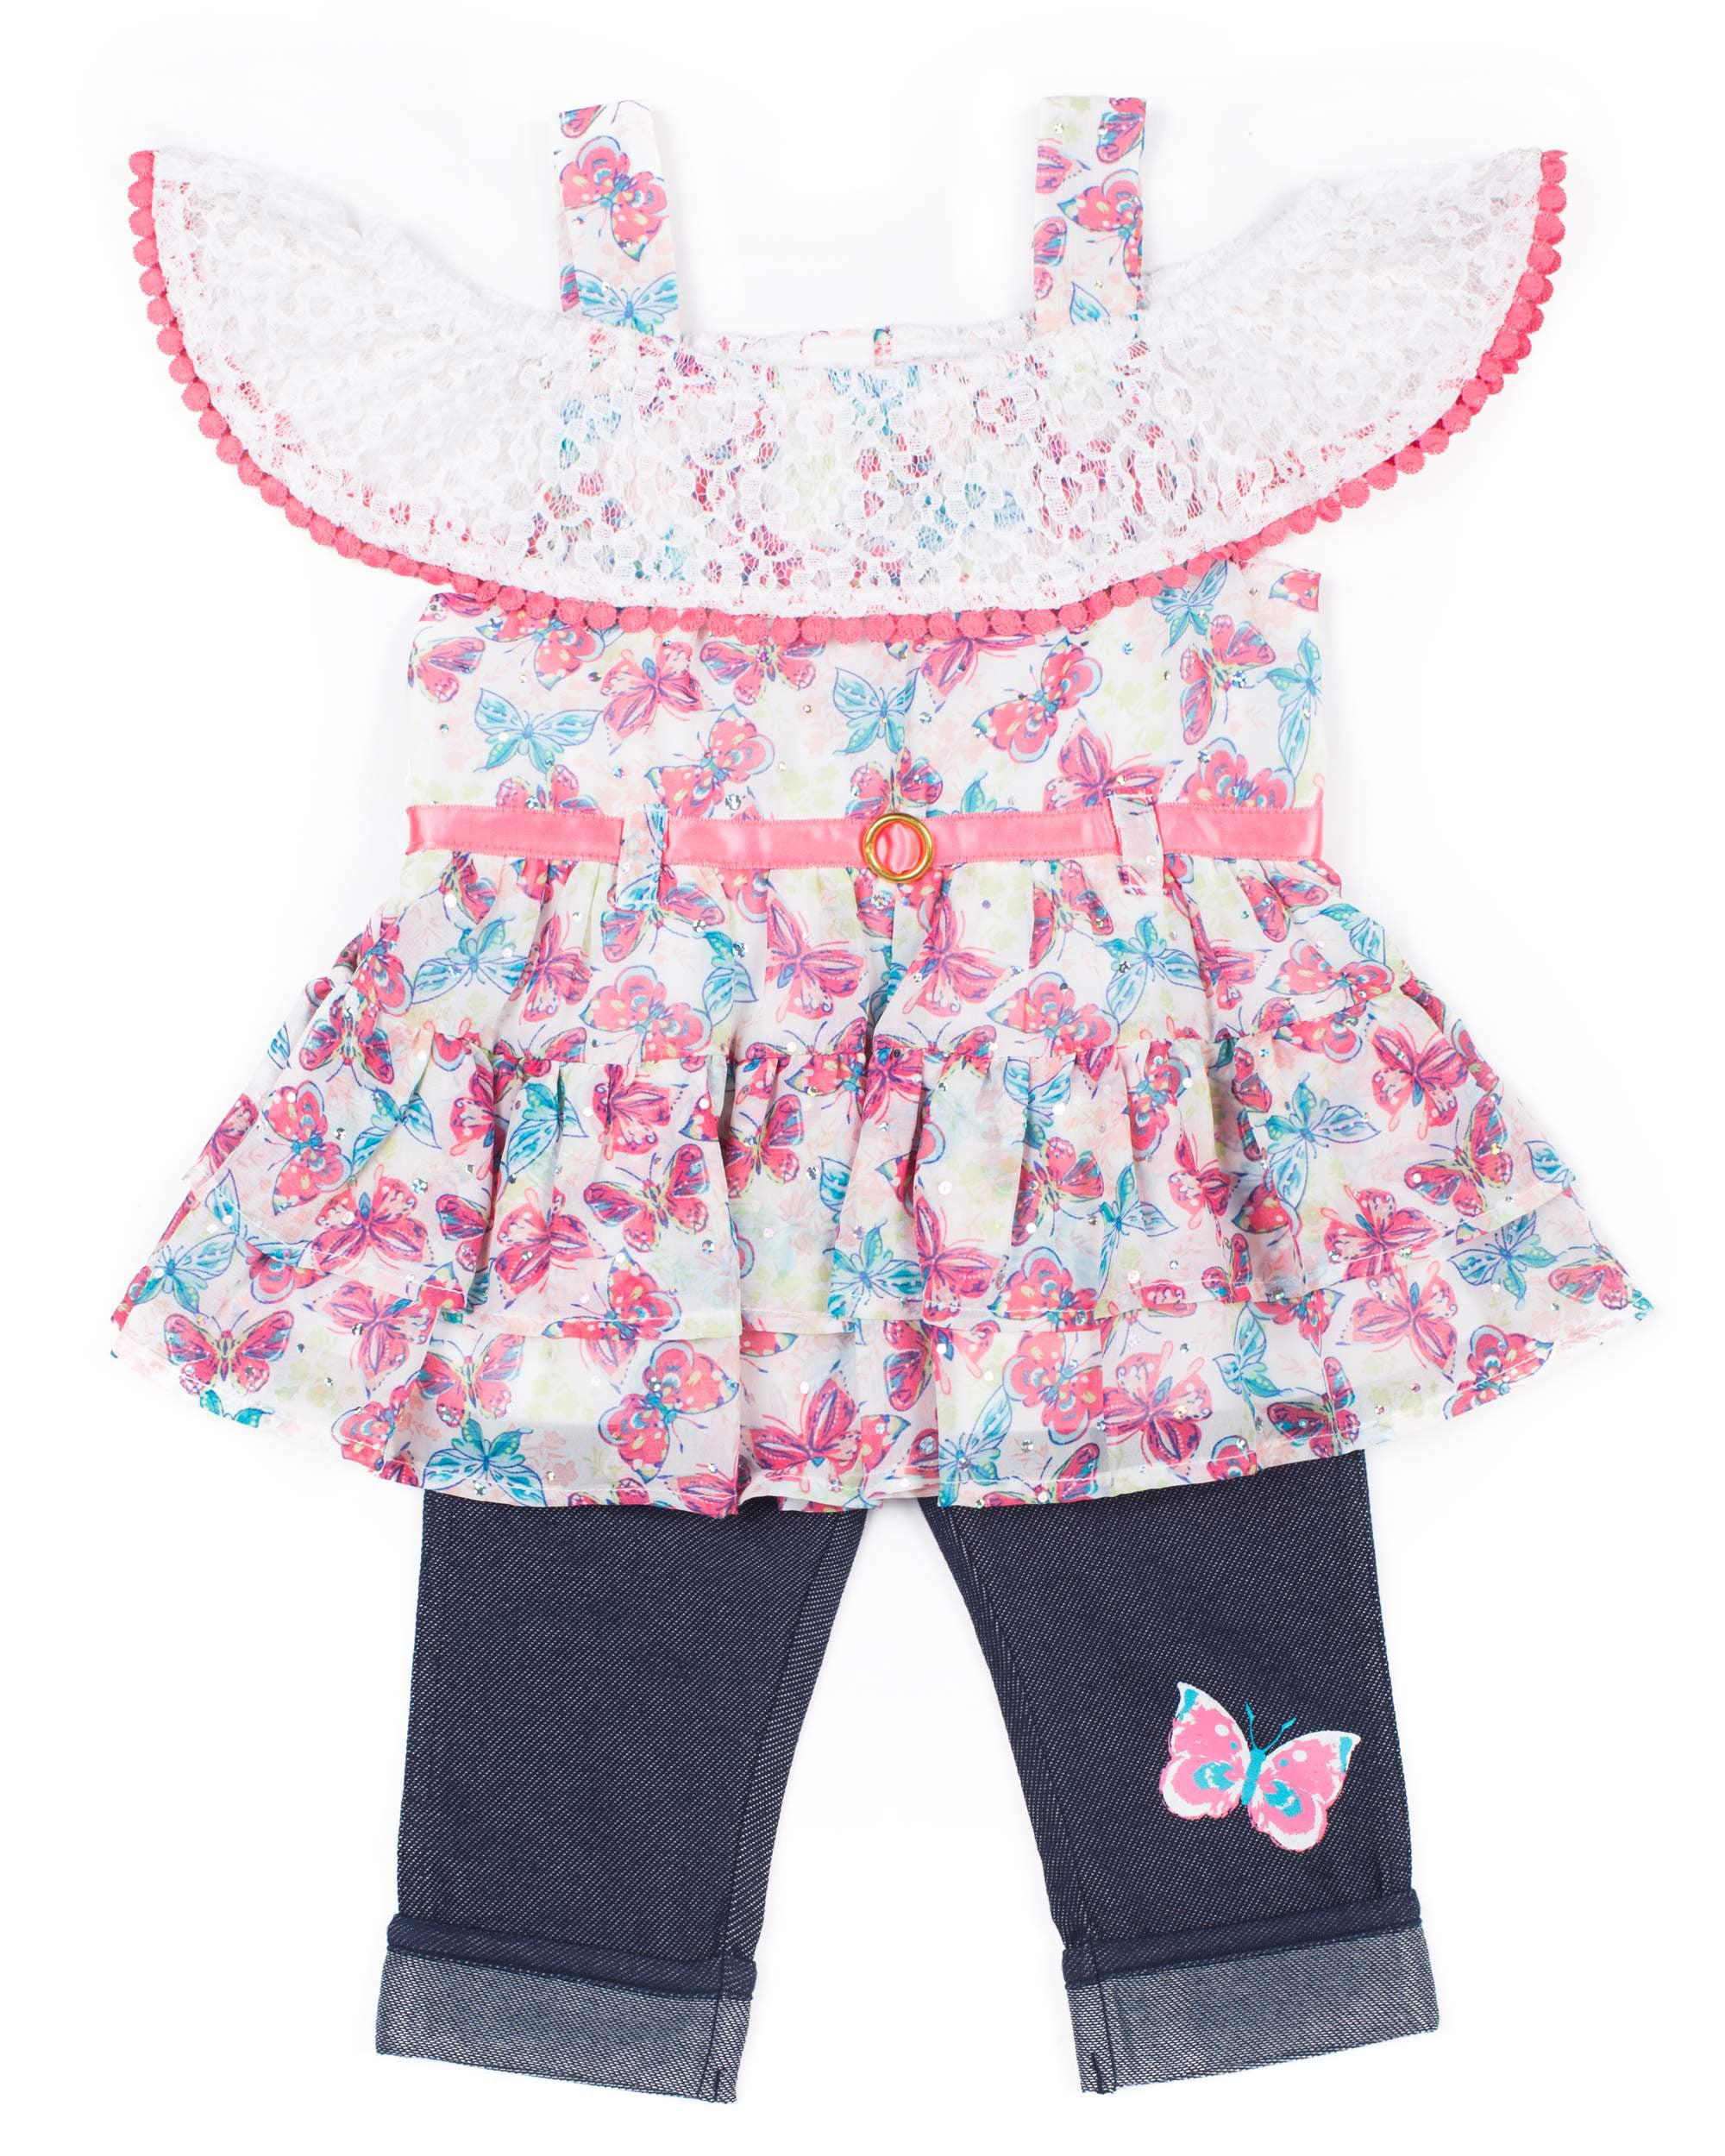 Short Sleeve Ruffled Chiffon Top & Capri, 2pc Outfit Set (Baby Girls & Toddler Girls)